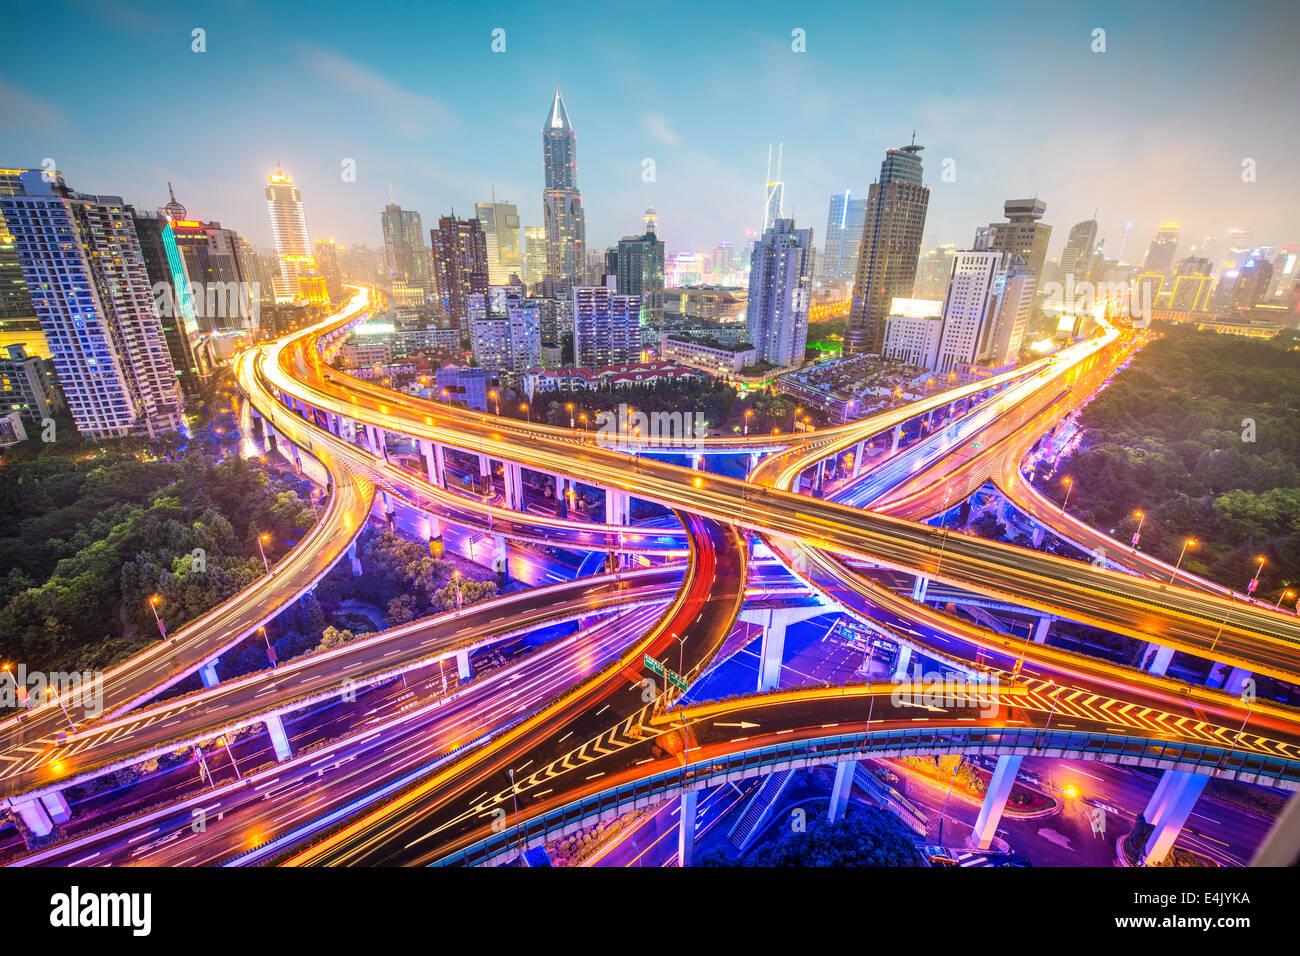 Shanghai, Cina vista aerea su autostrade. Immagini Stock